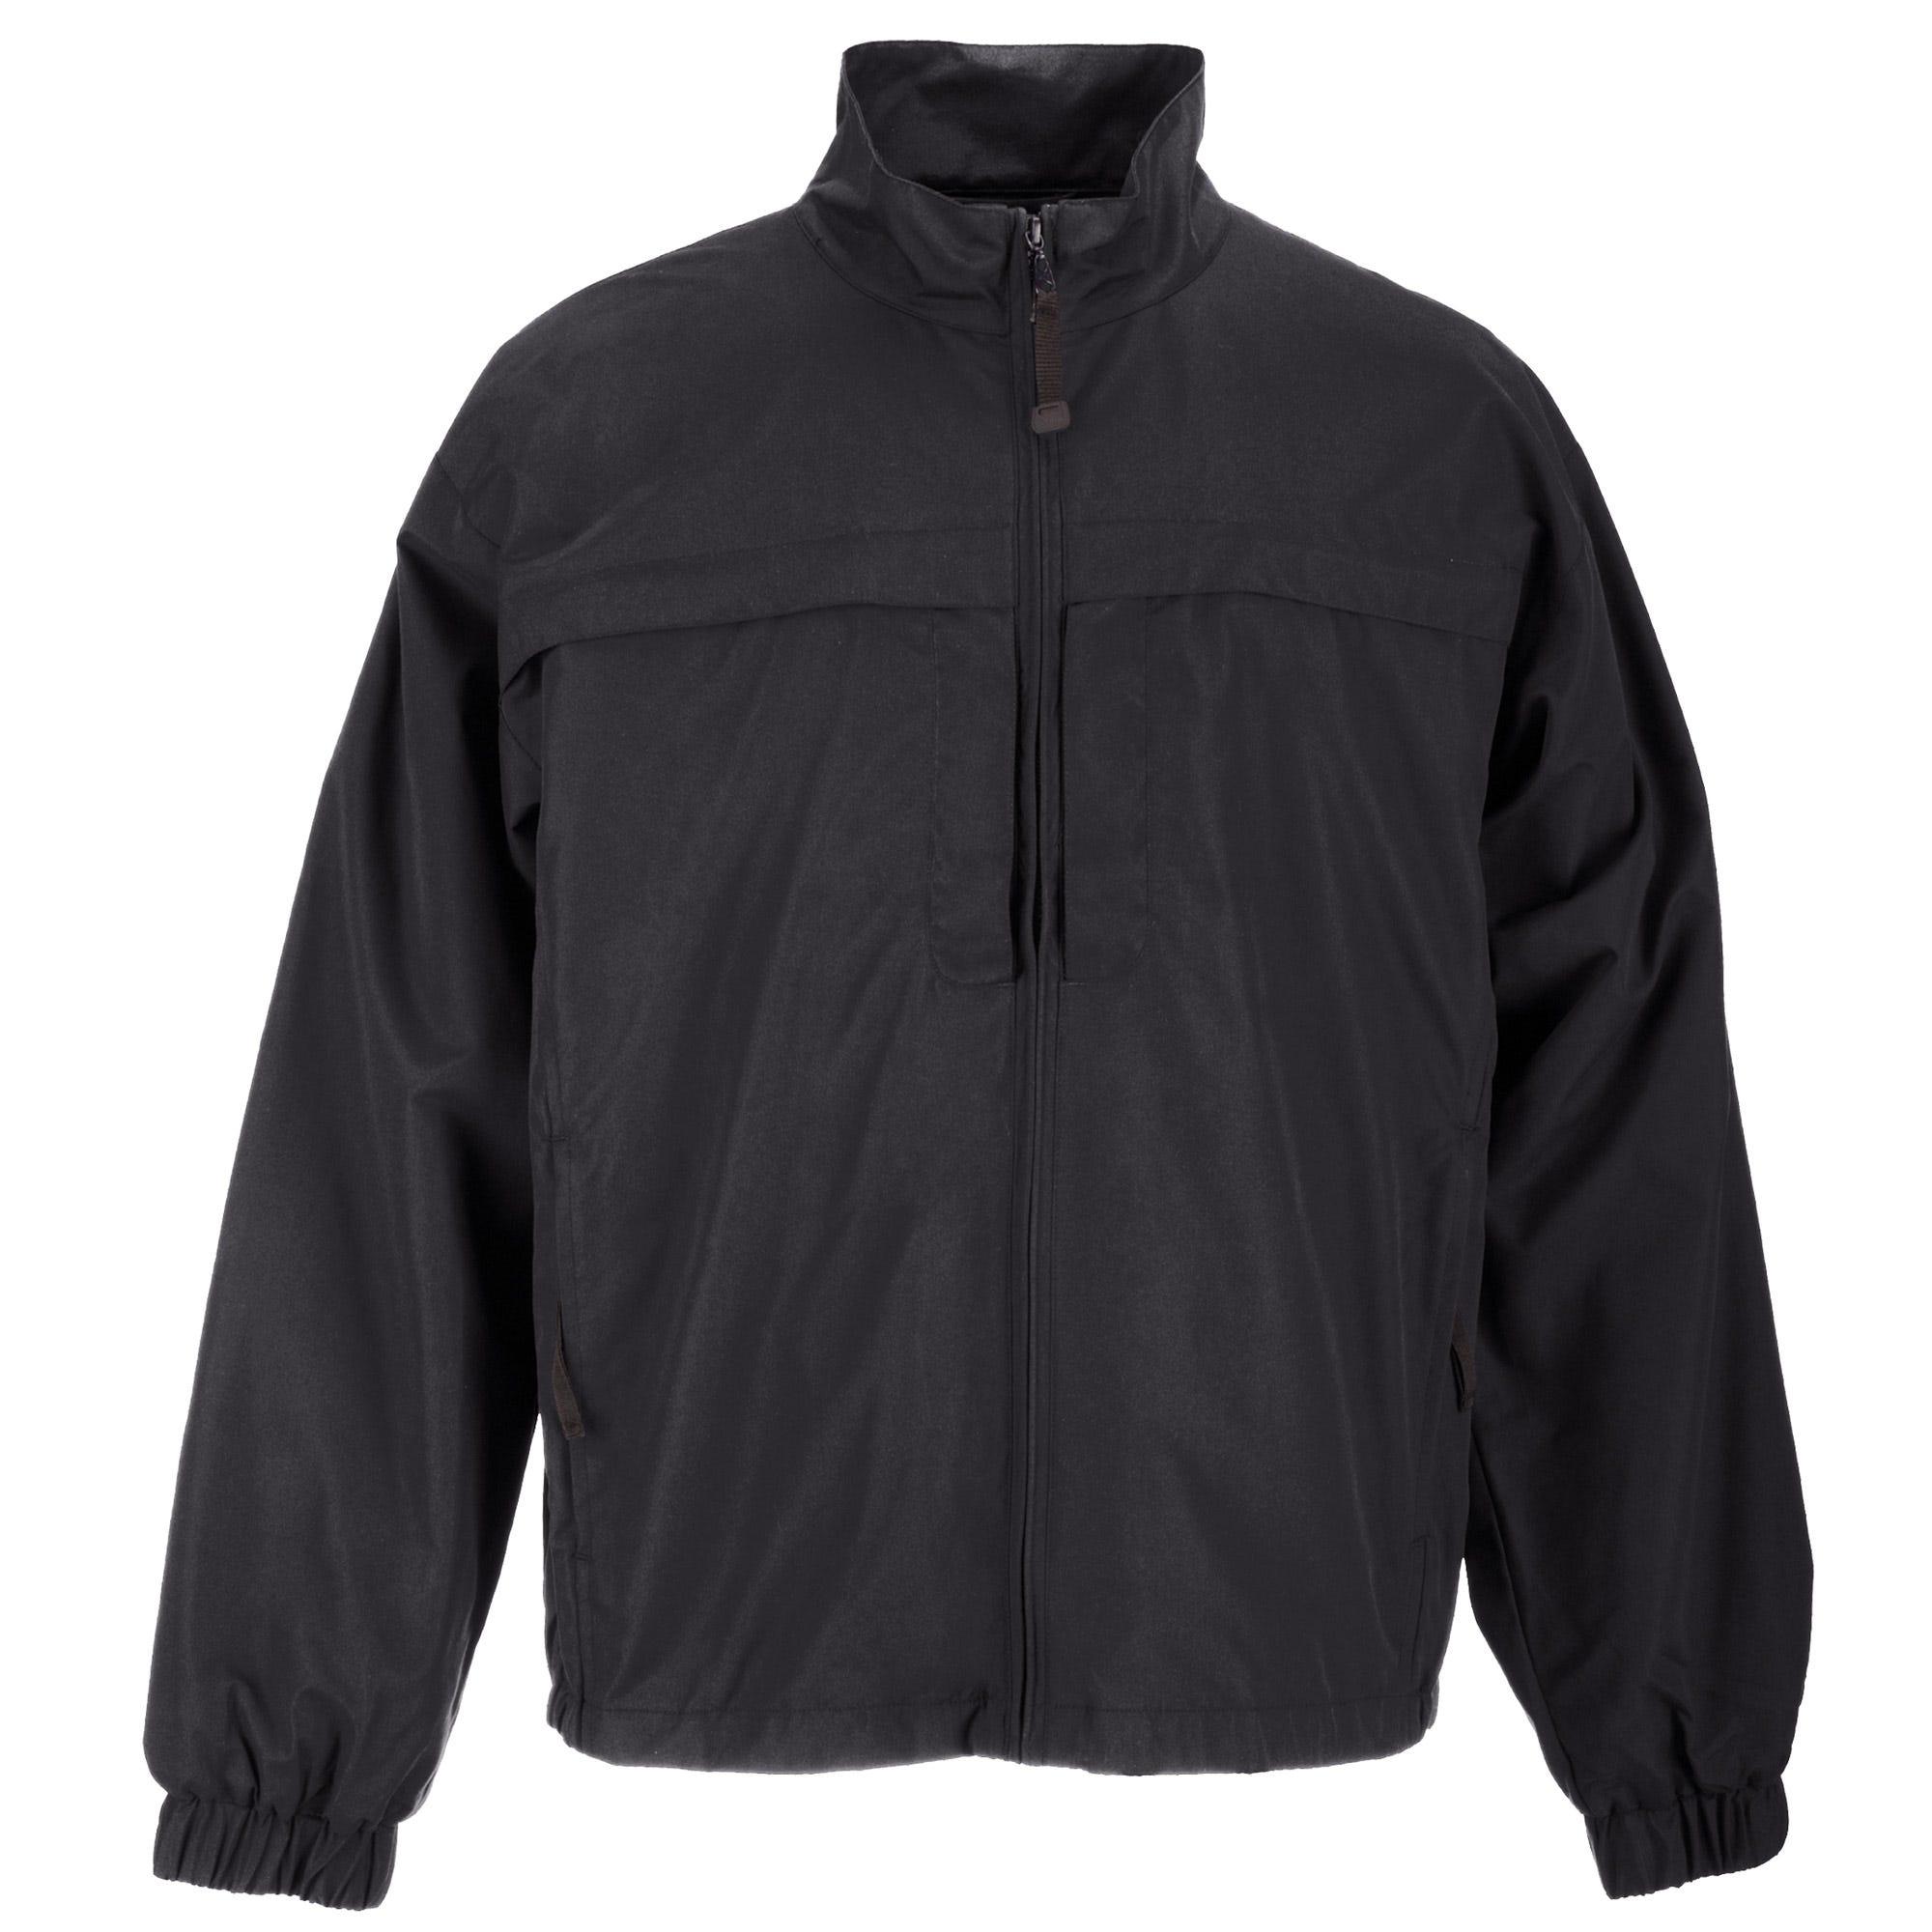 5.11 Tactical Men's Response Jacket (Black)